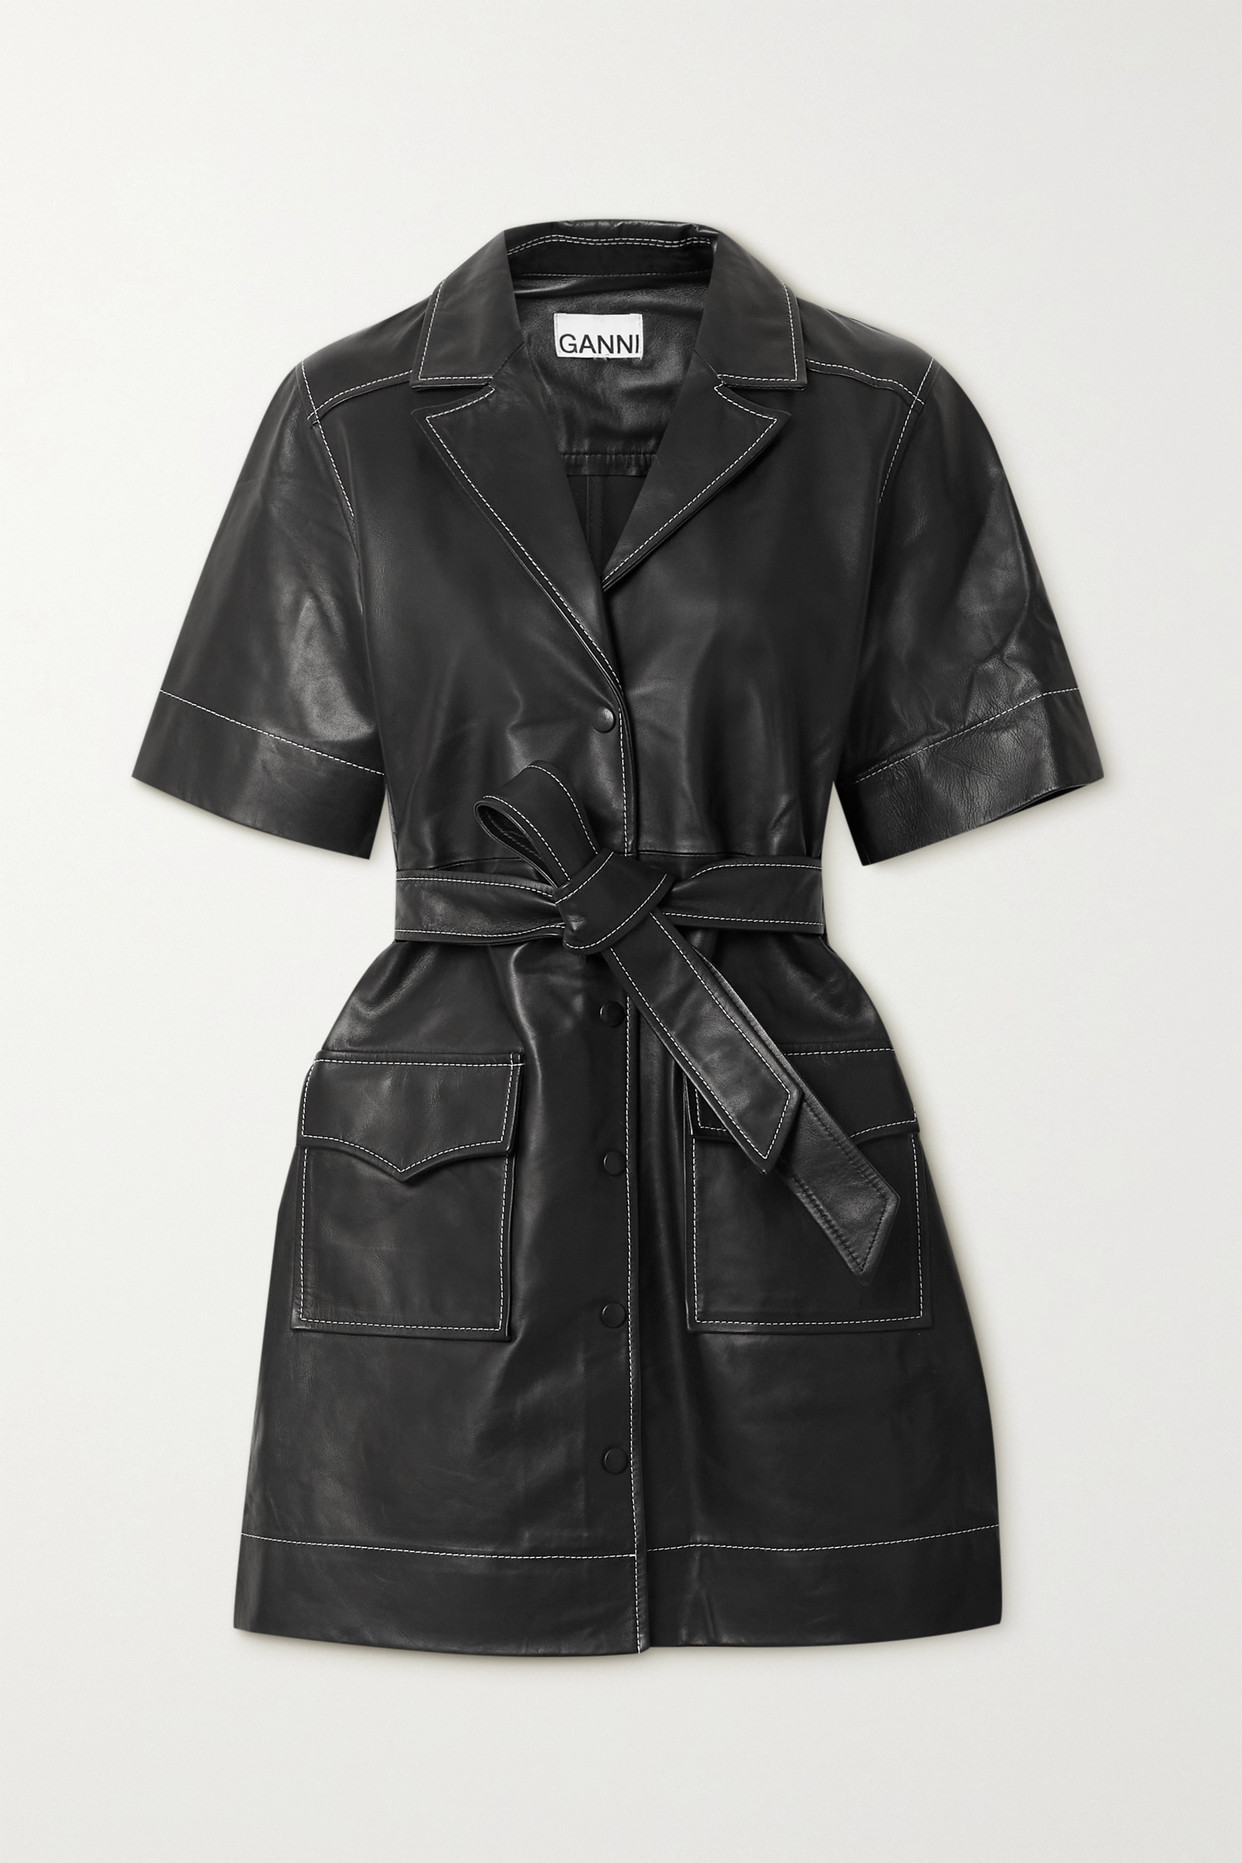 Ganni Belted Leather Mini Dress In Black